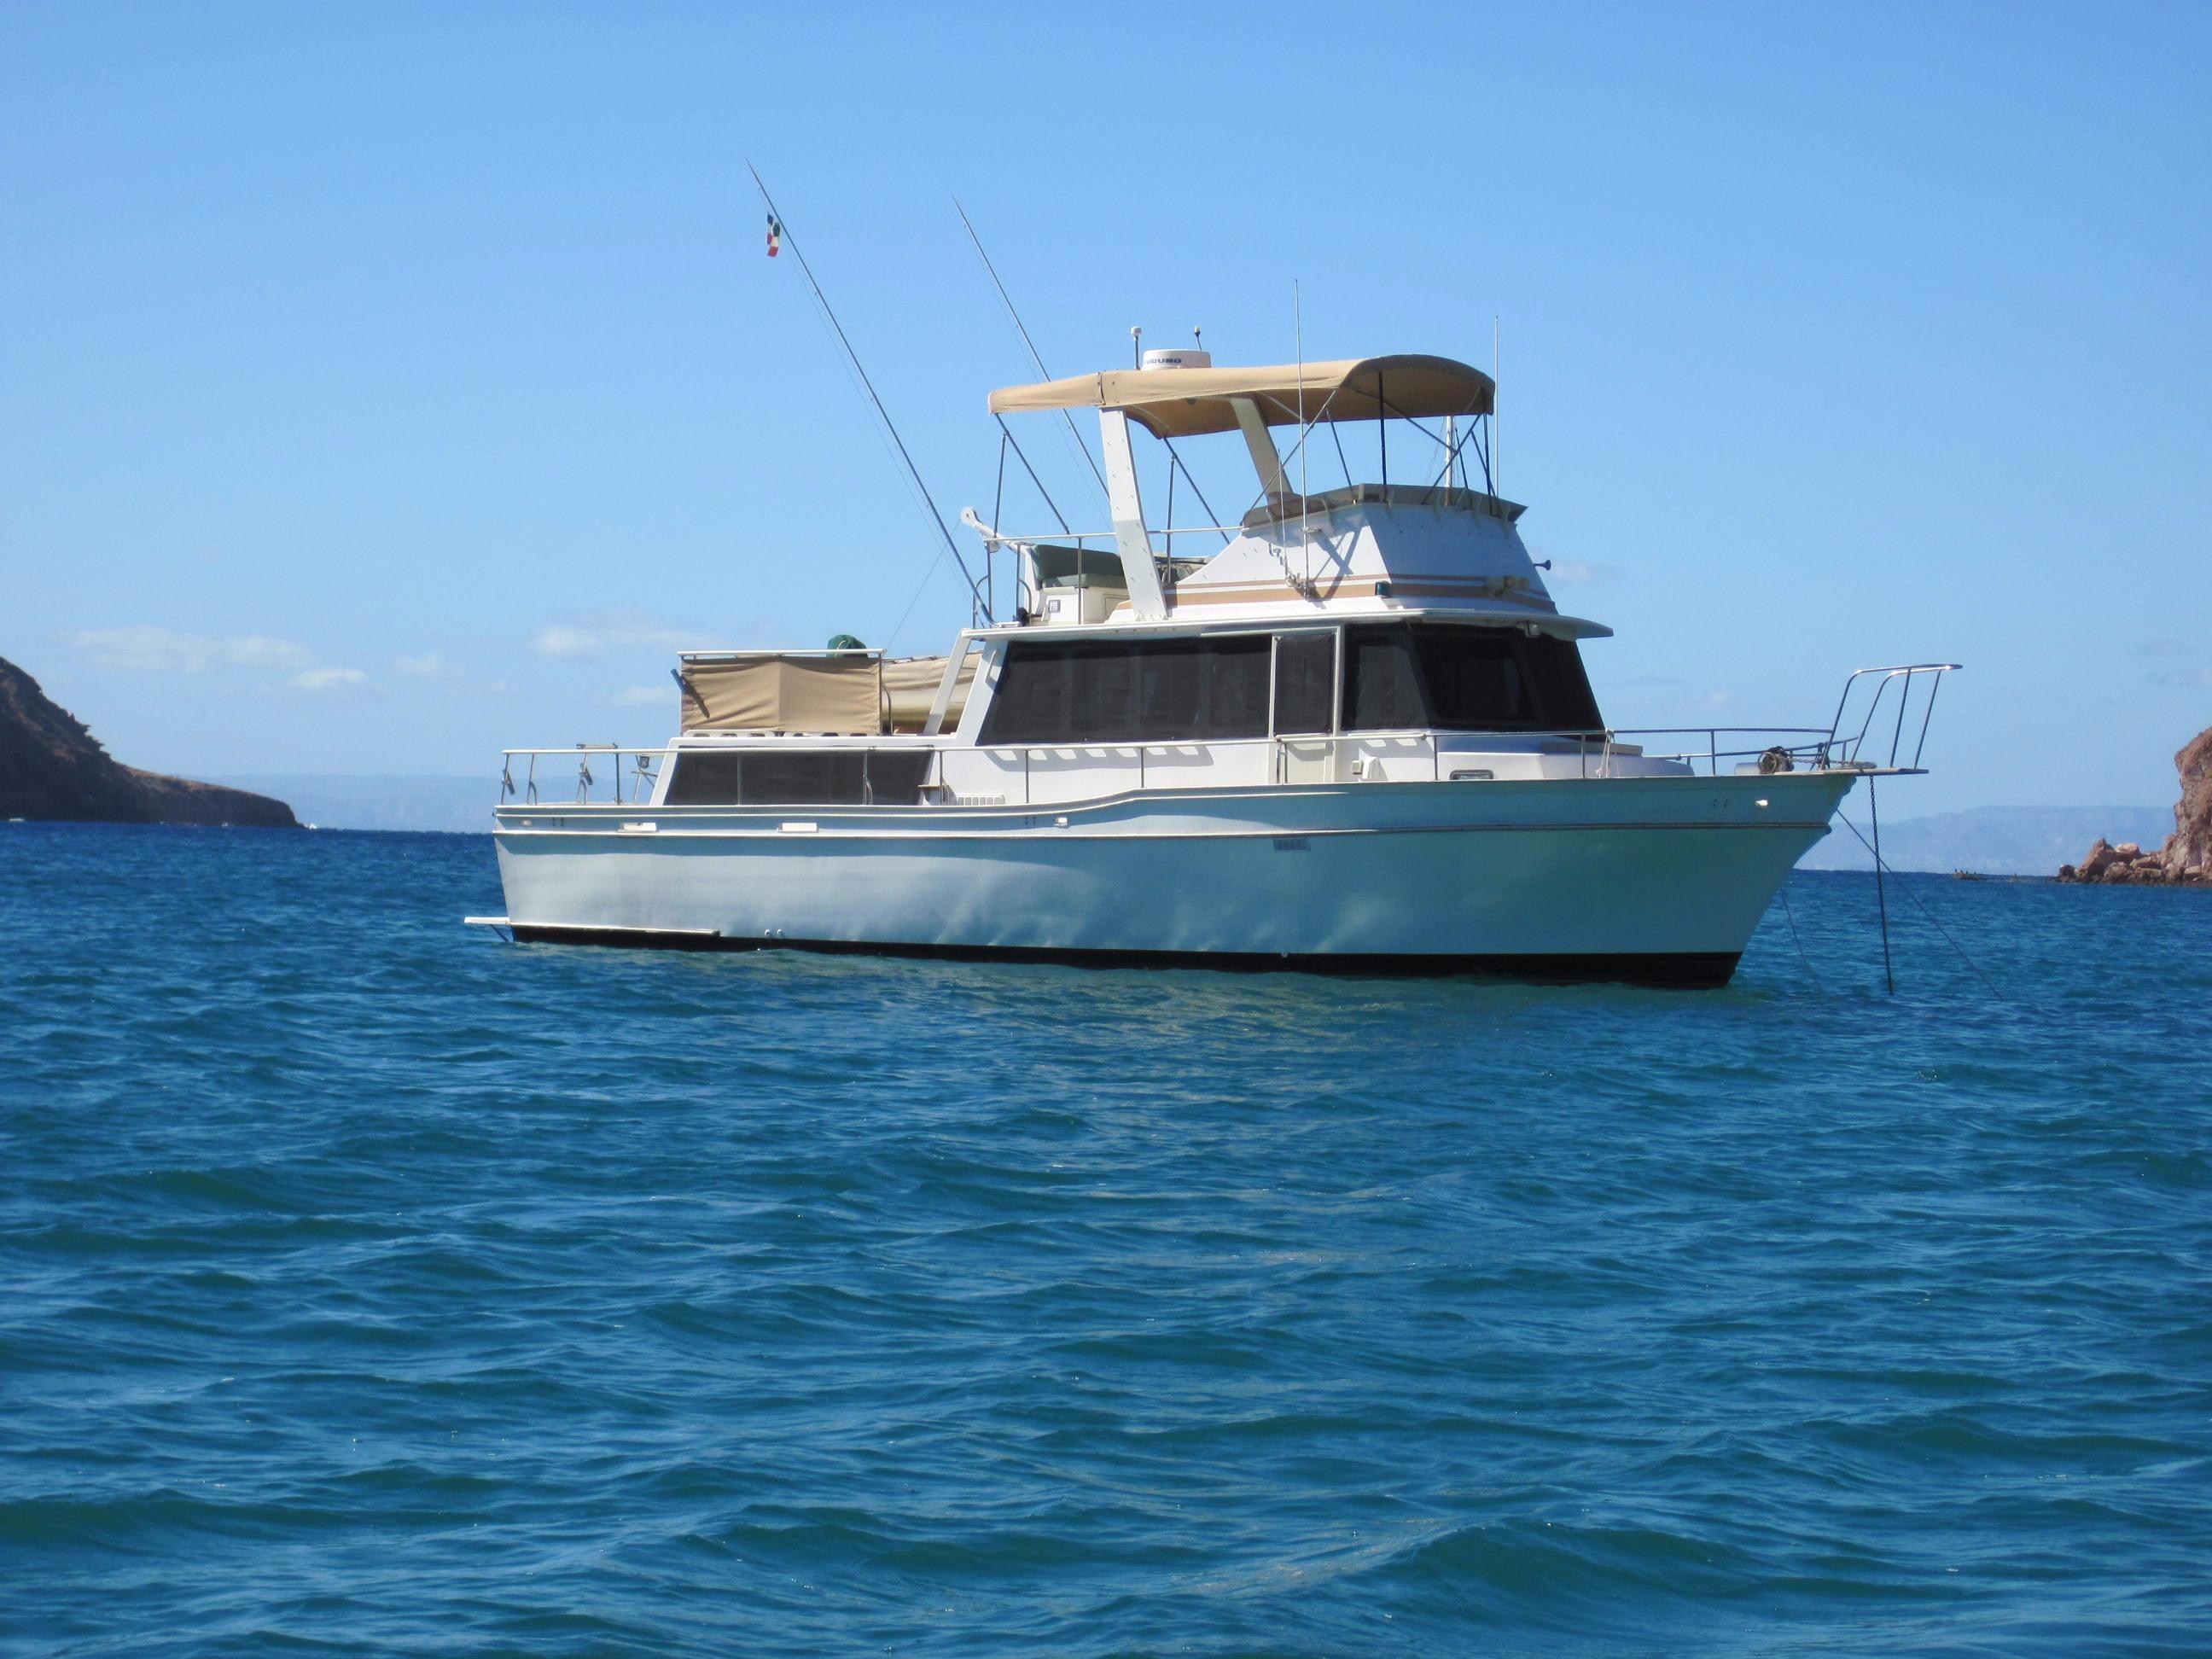 42' Californian LRC Trawler+Boat for sale!